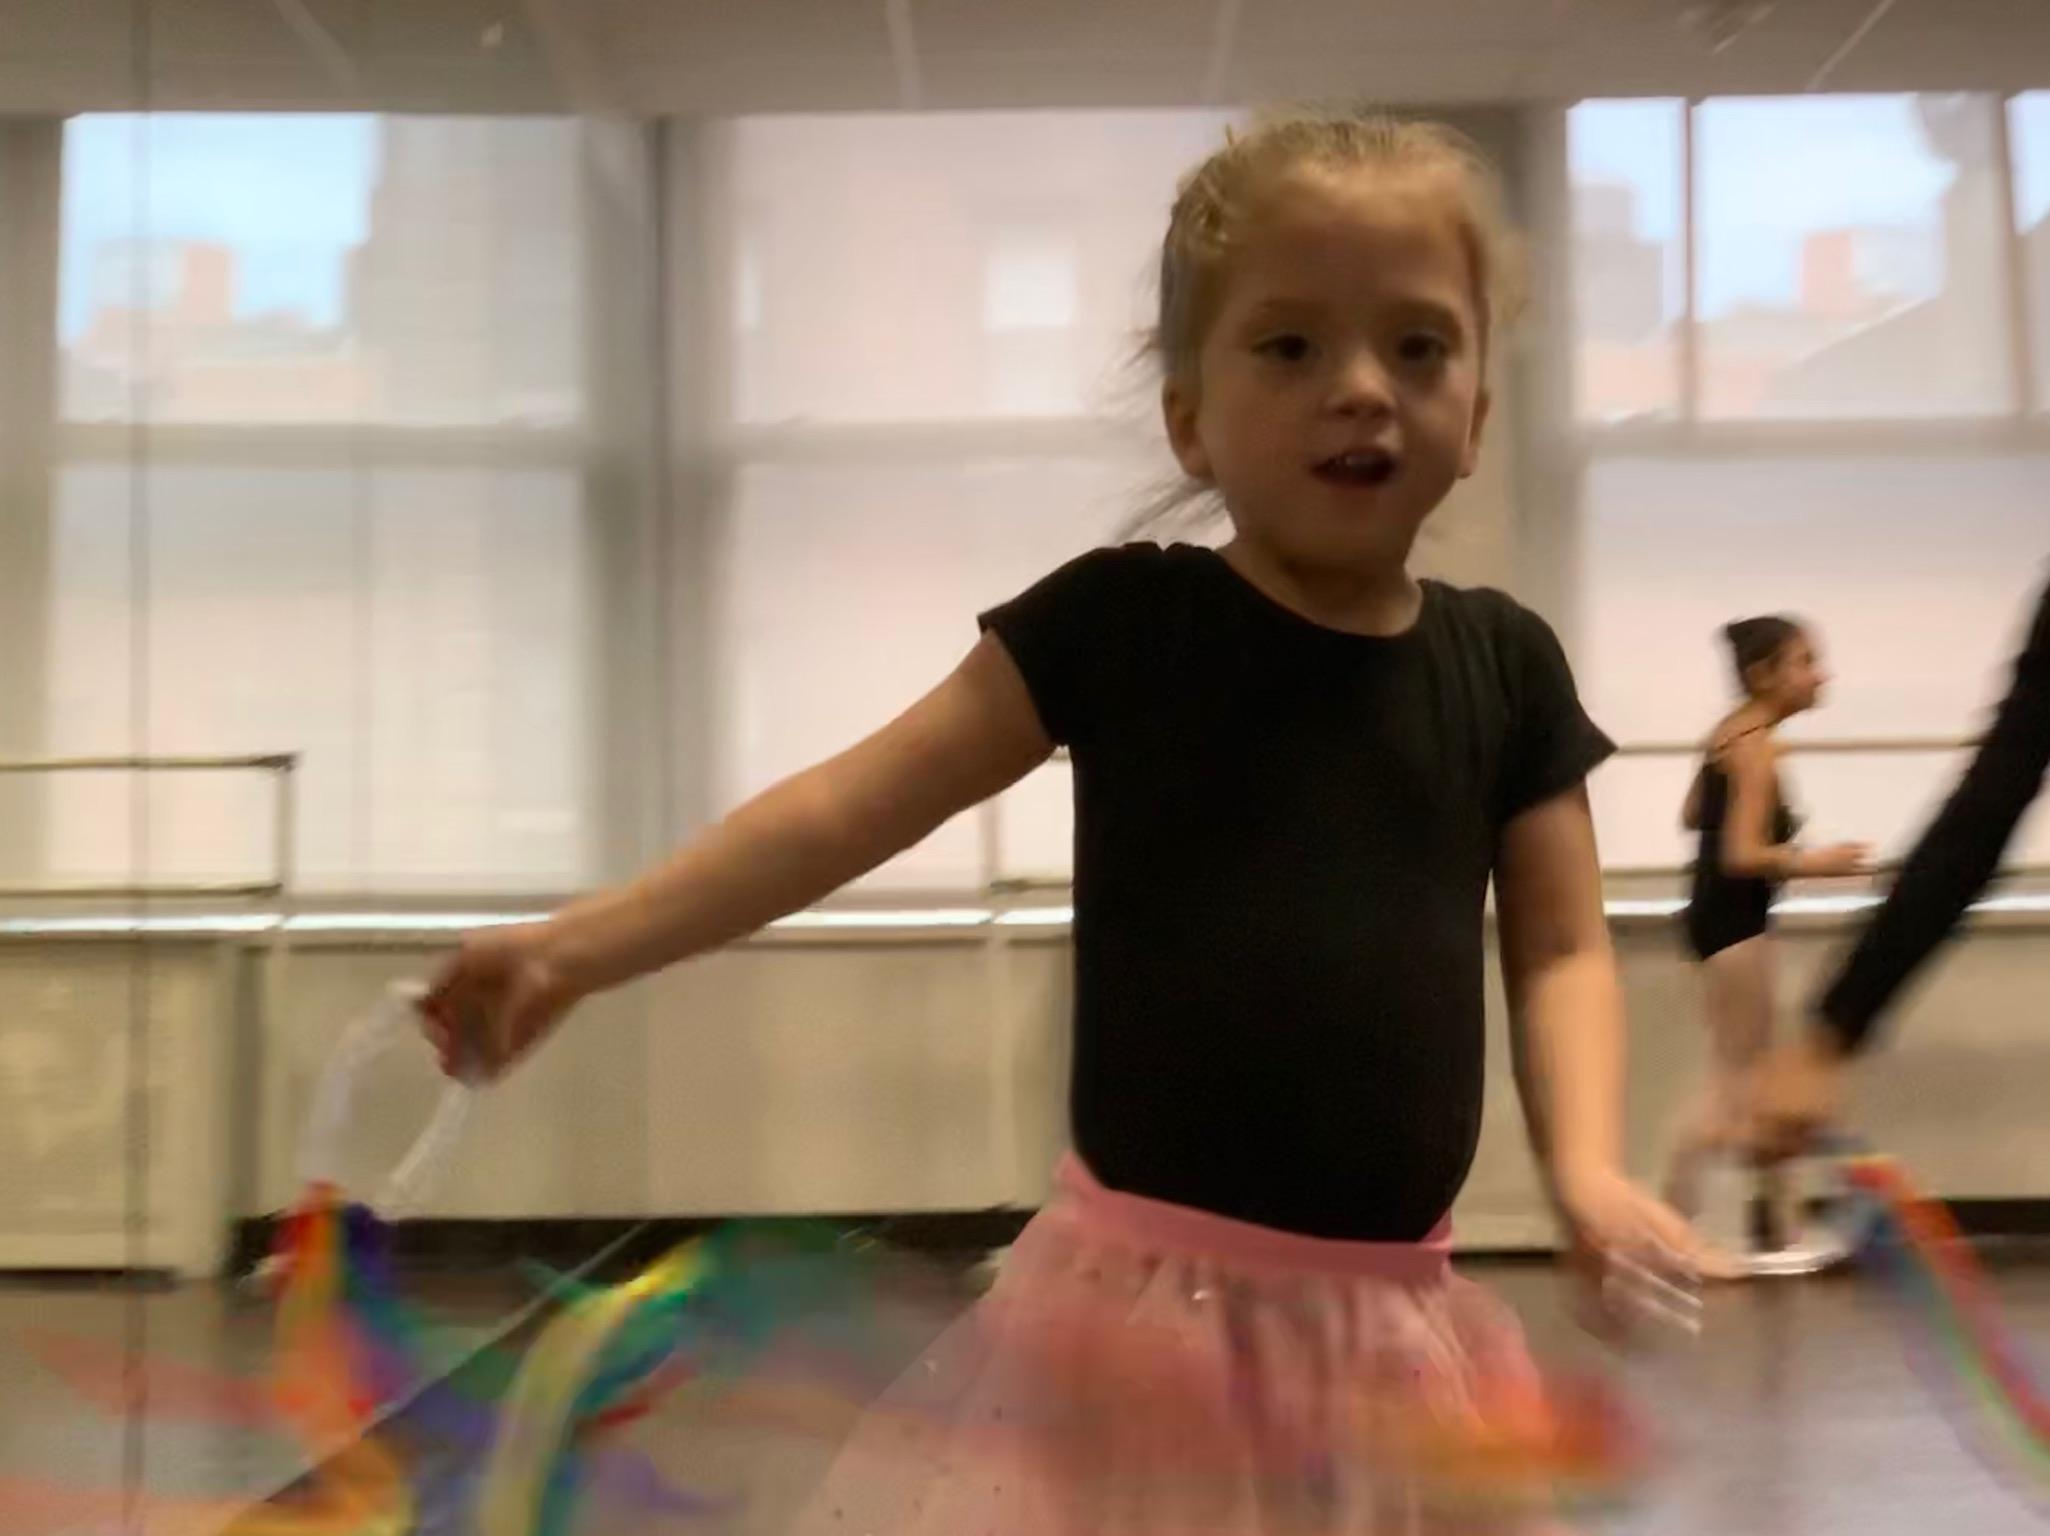 Blurry Ballerina